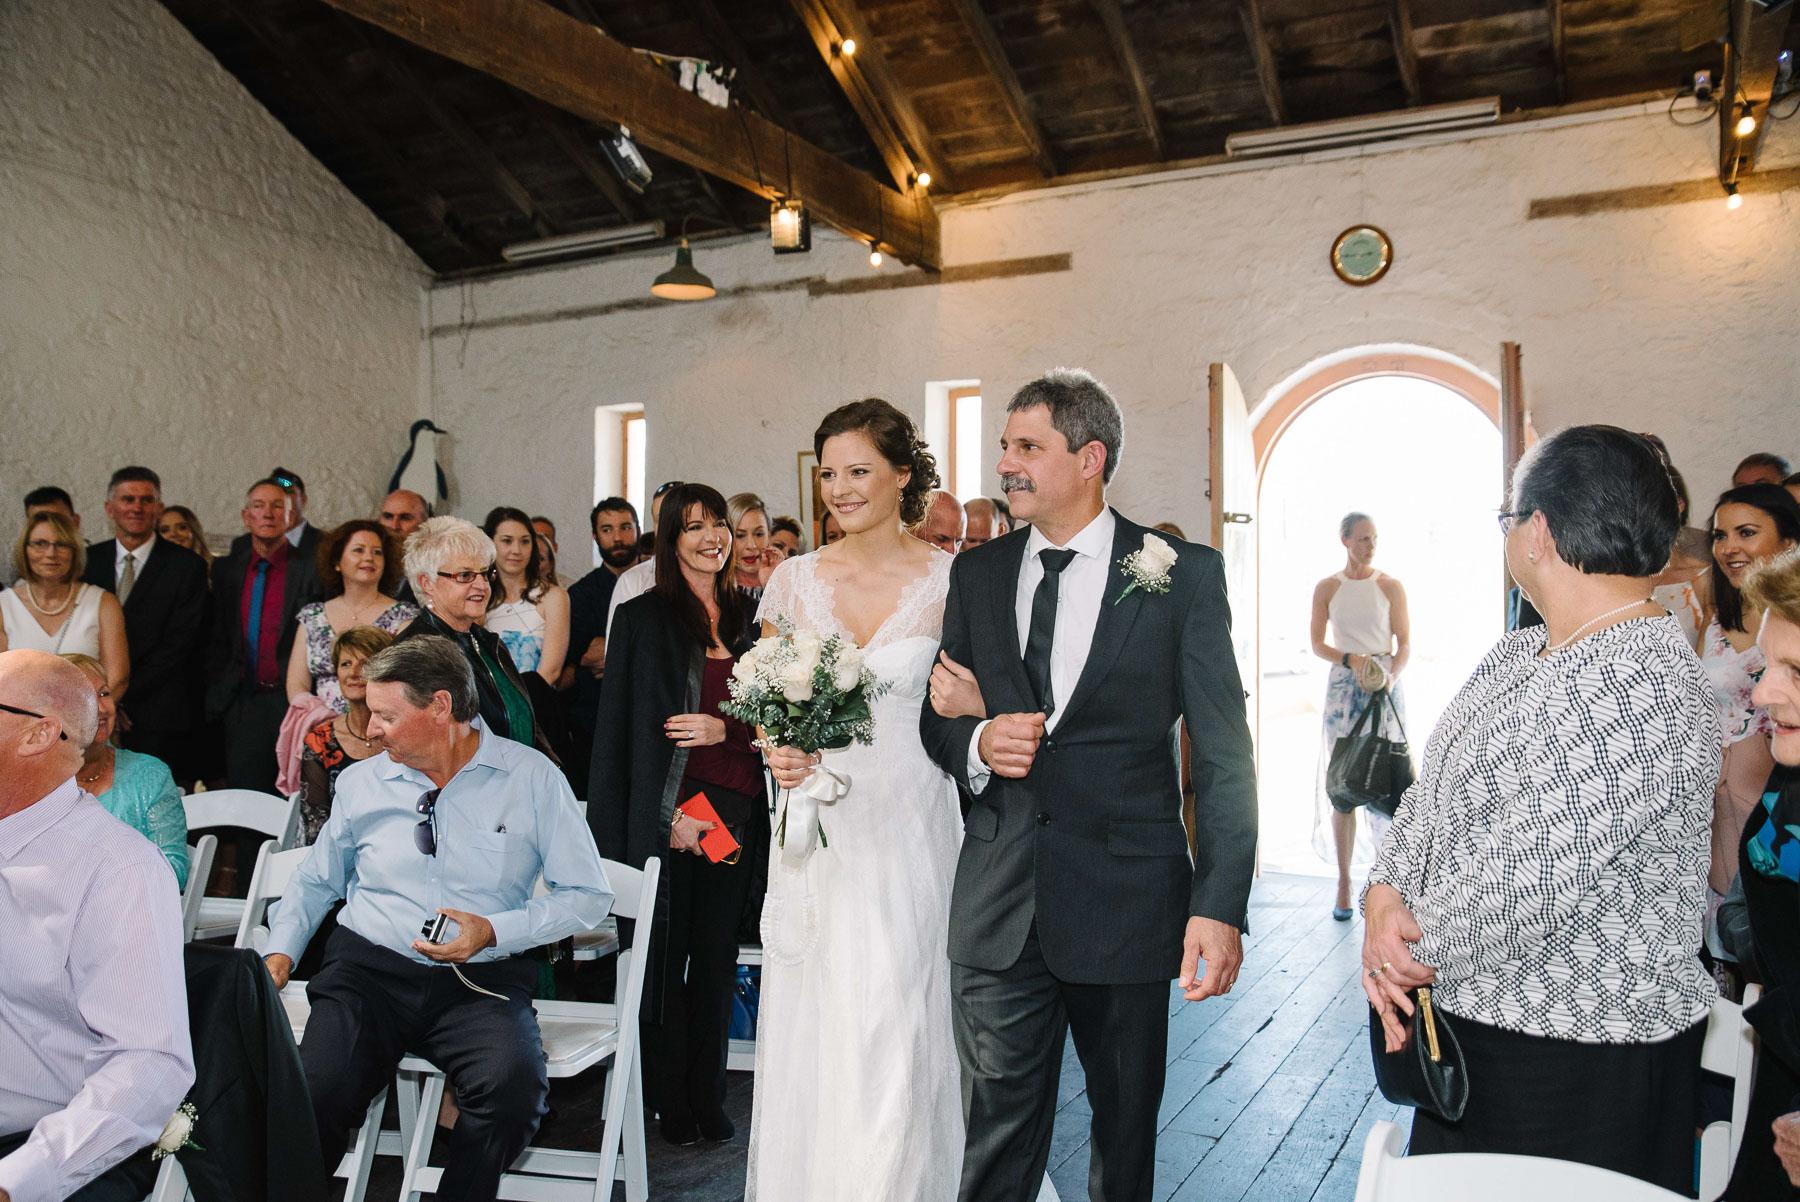 28-fremantle wedding venue.jpg